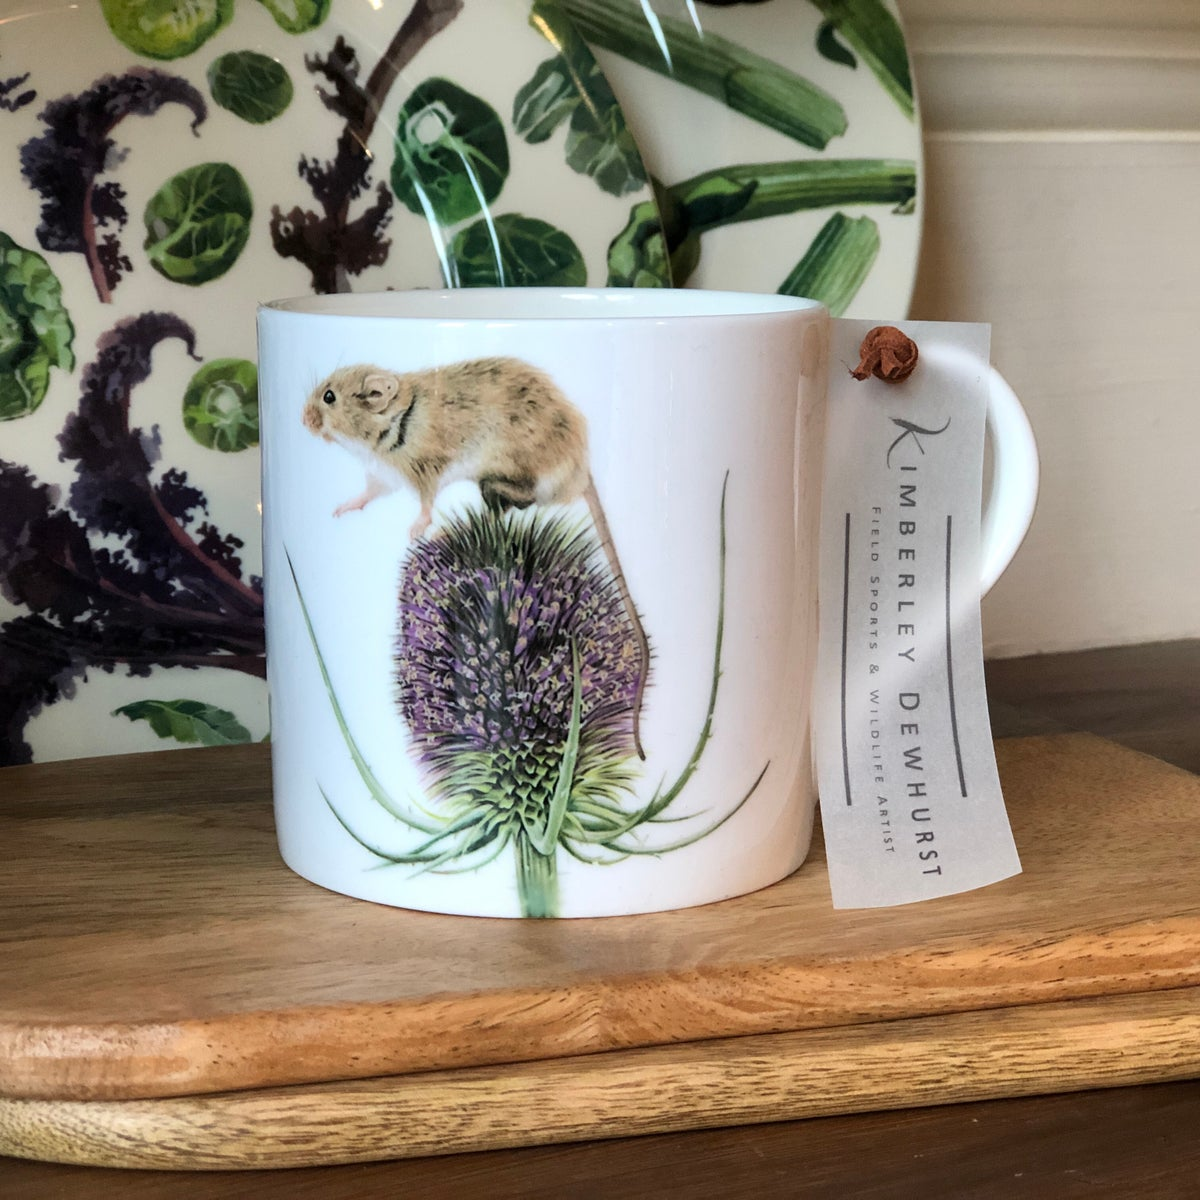 Image of 'One Small Step For Mice' Mug